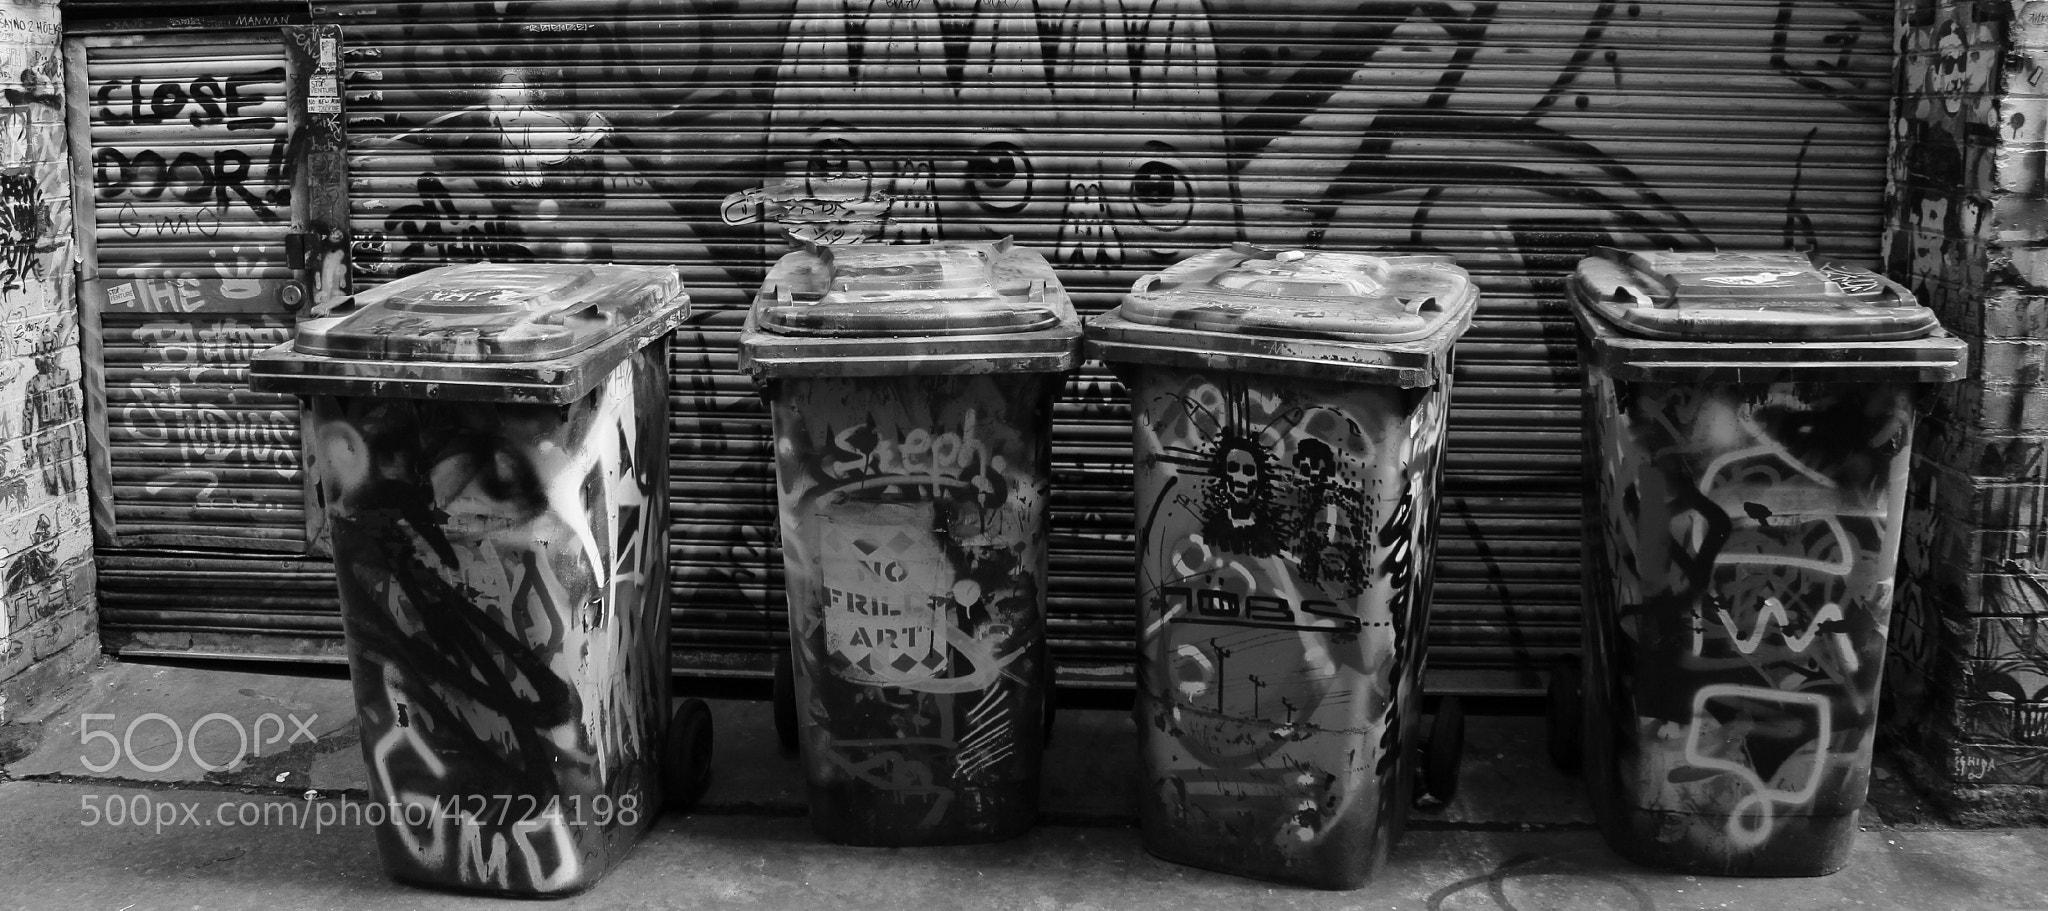 Photograph Graffiti Bins by Meg T on 500px